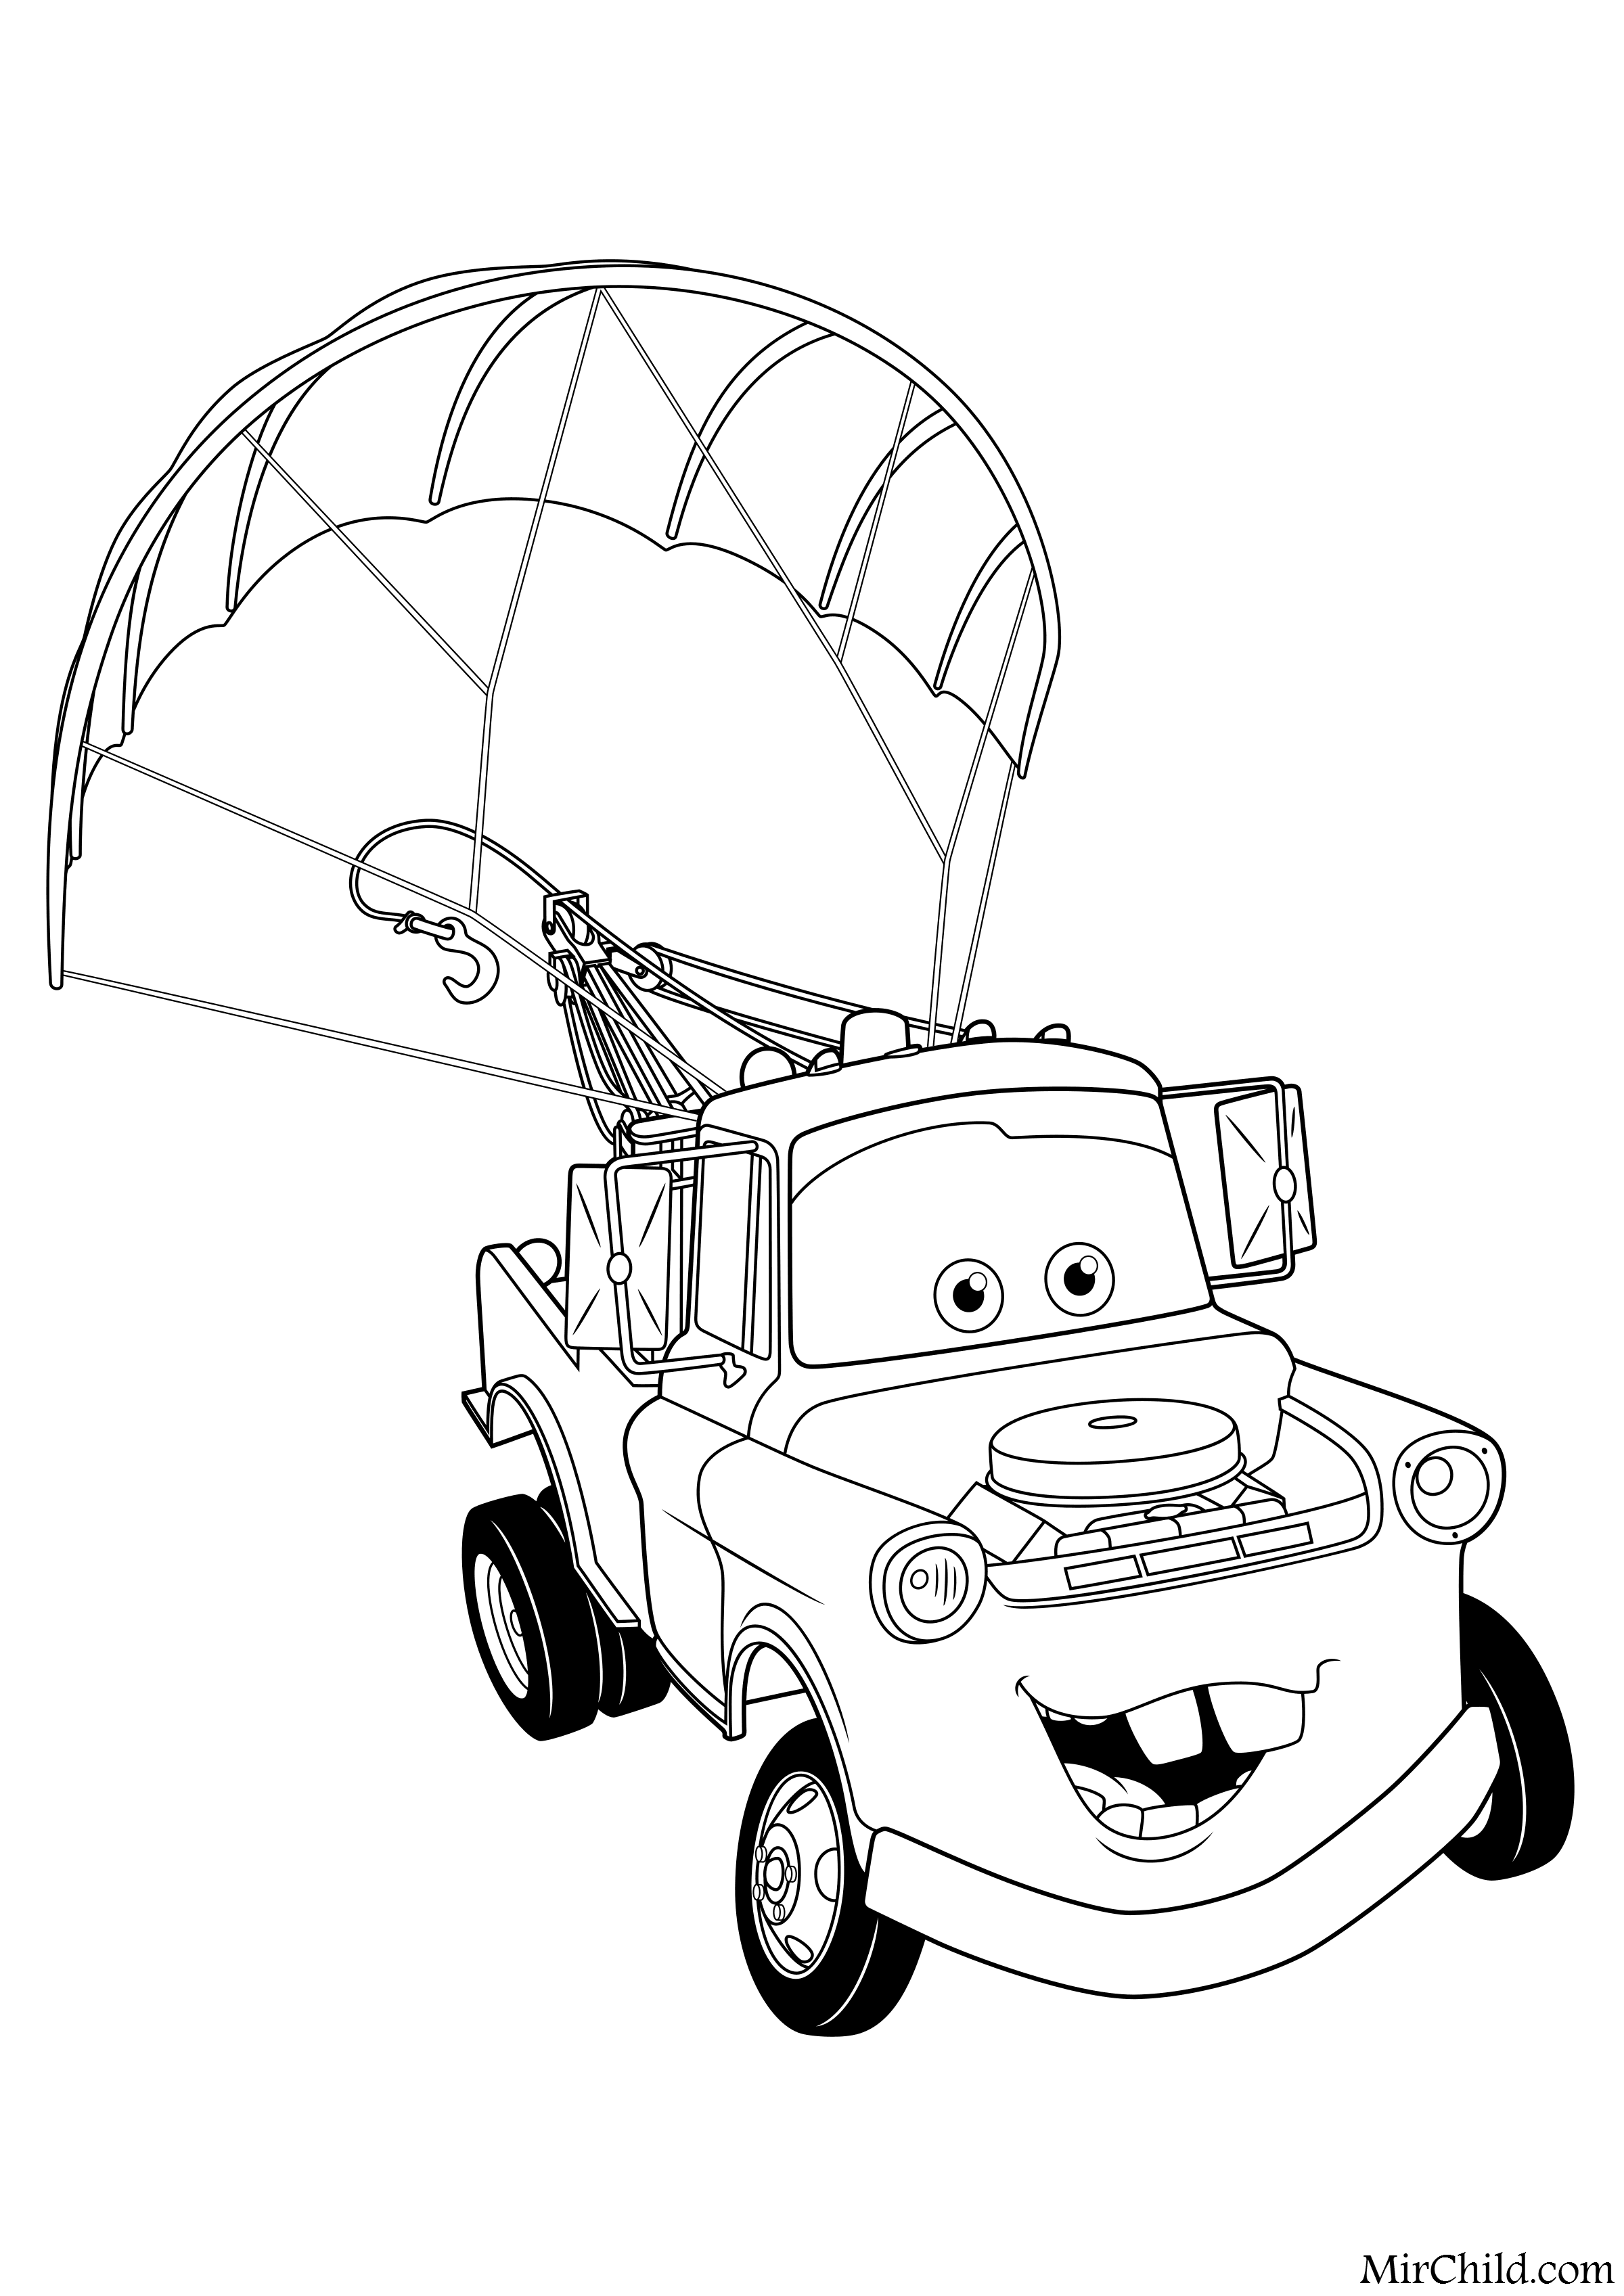 Раскраска - Тачки 2 - Мэтр с парашютом | MirChild